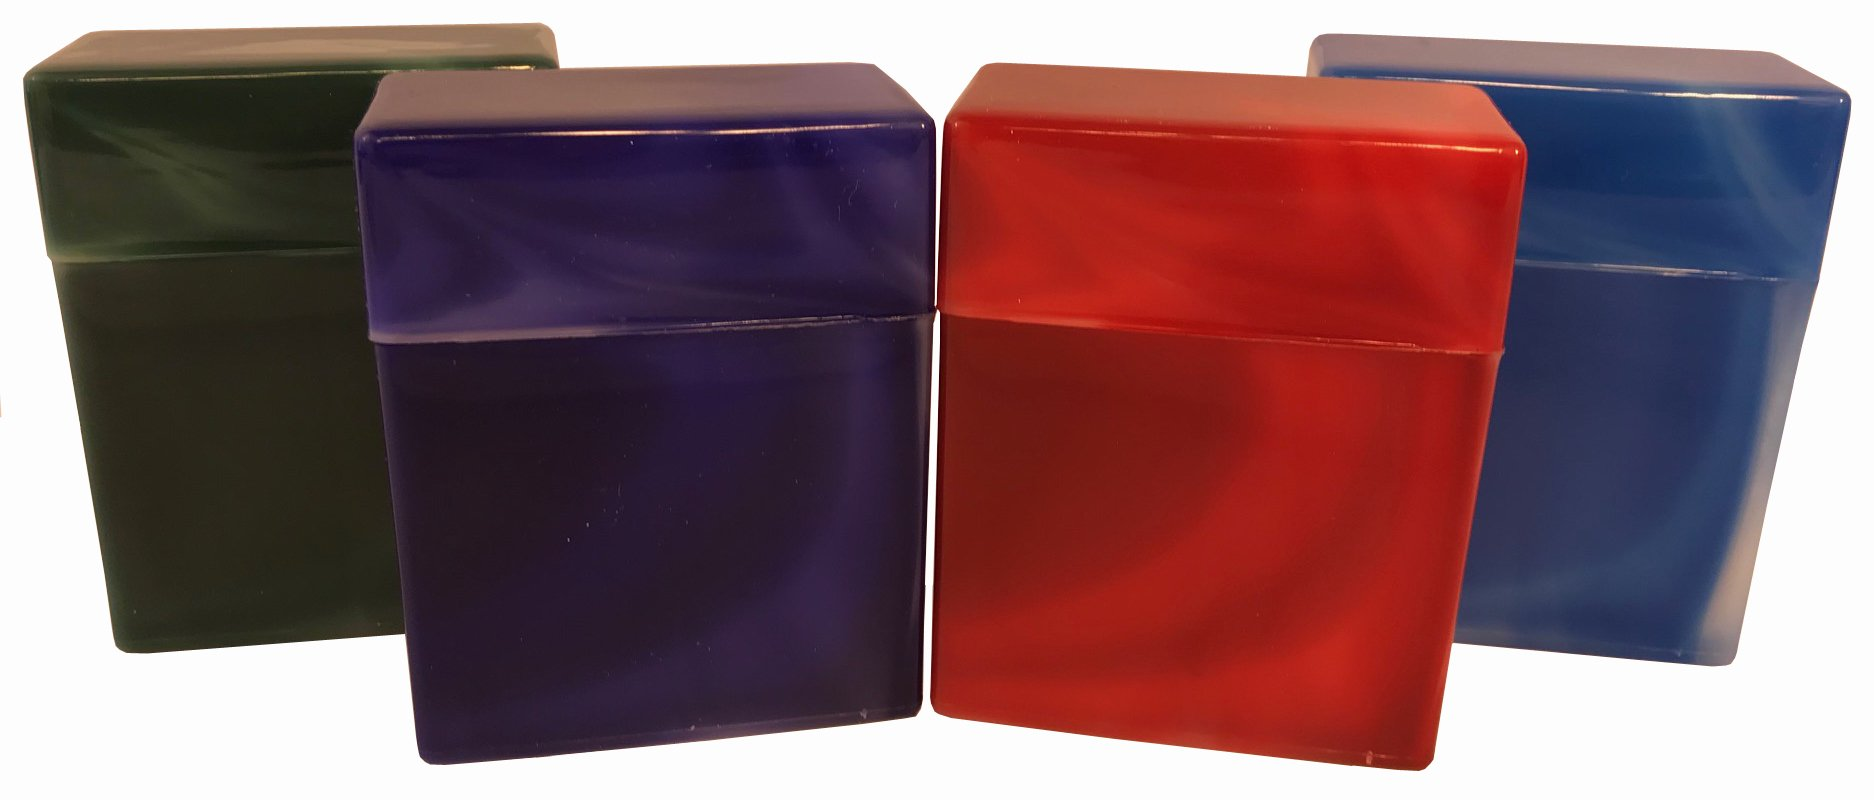 4 Pack King Size Crush-Proof Plastic Flip Open Case Holds 30 Cigarettes